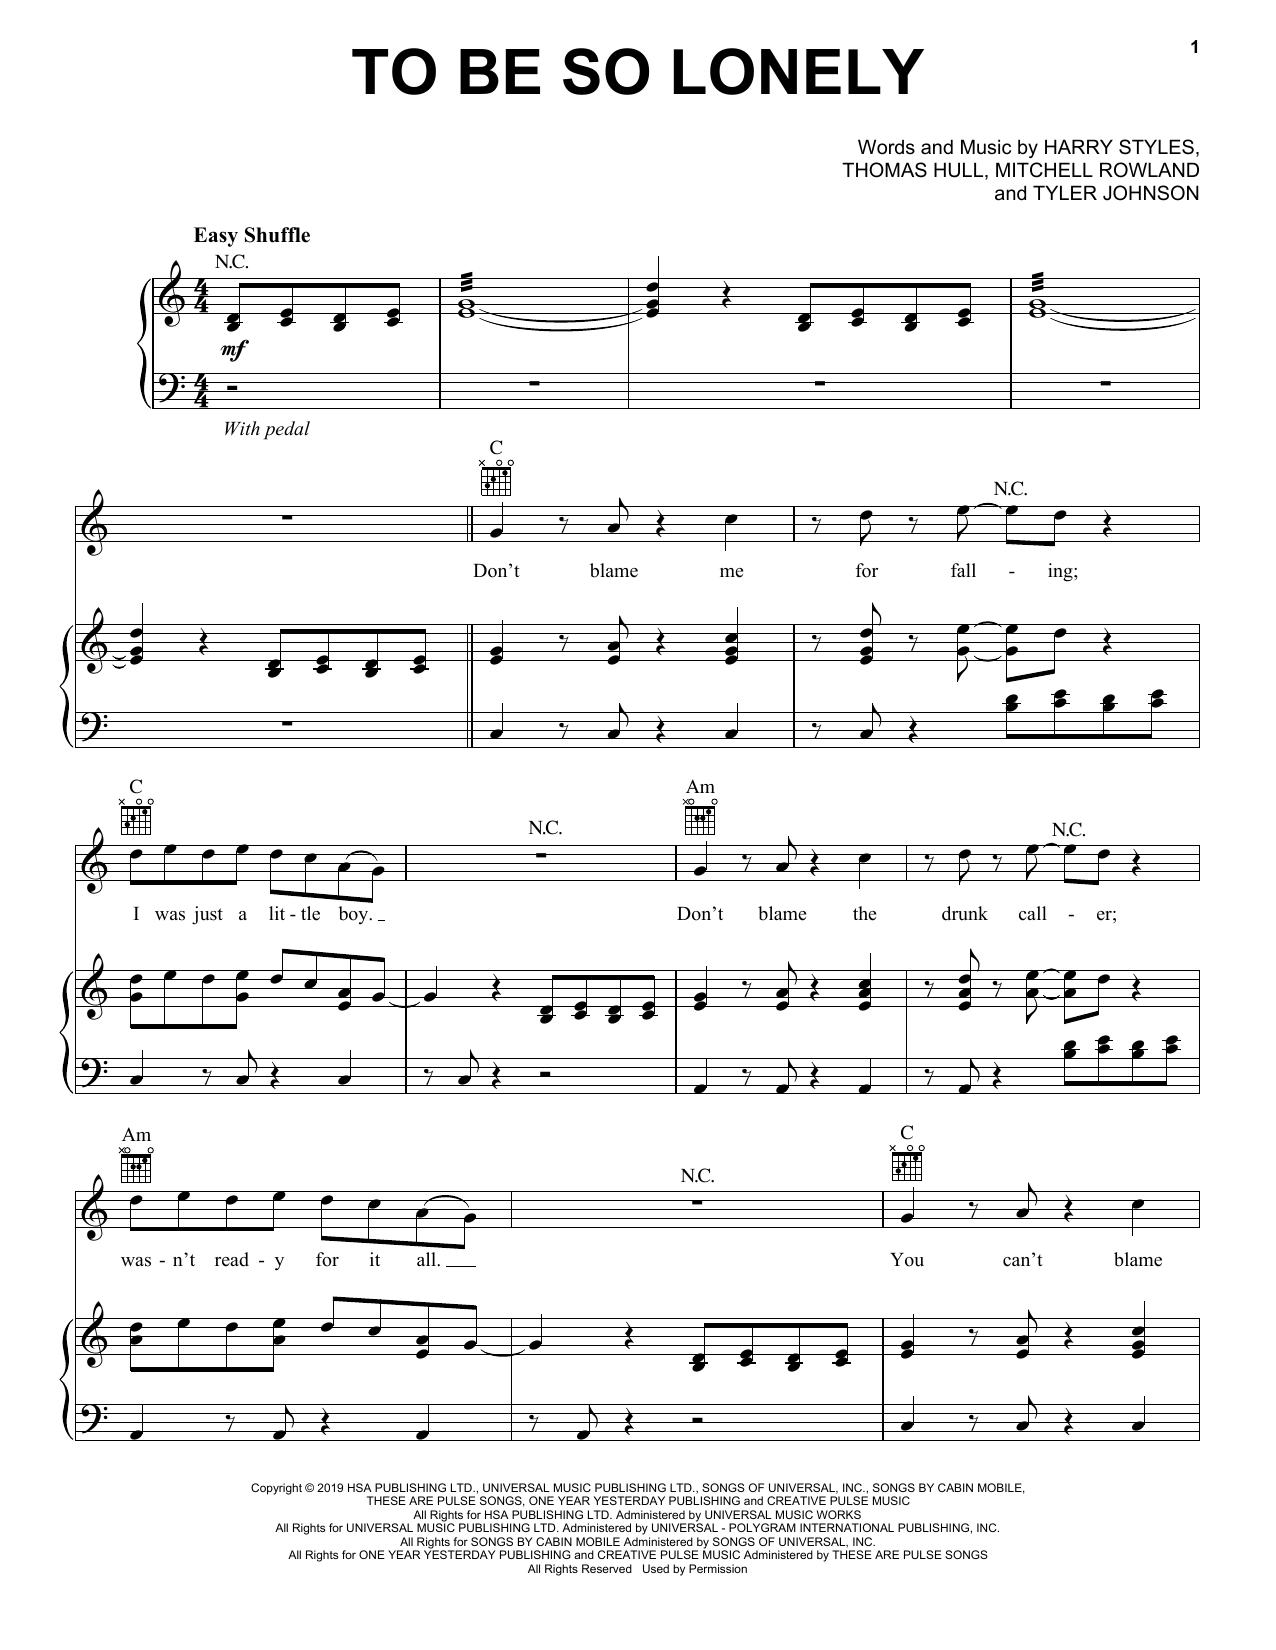 becky lynch theme song mp3